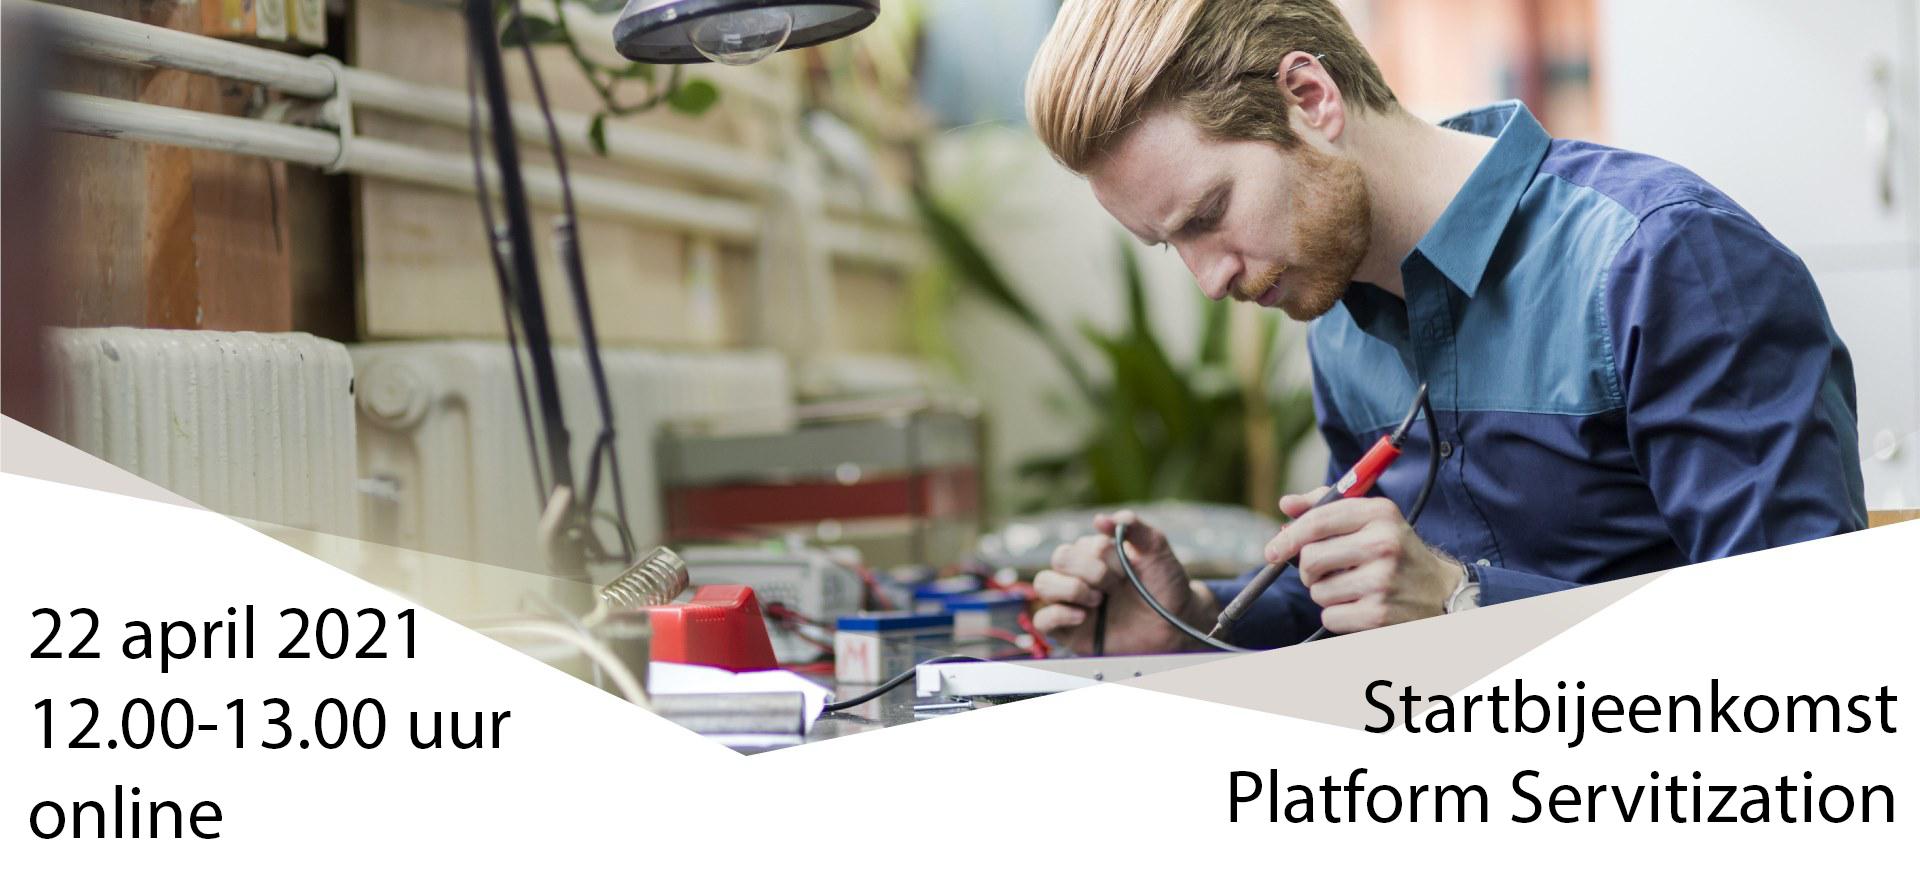 Platform Servitization